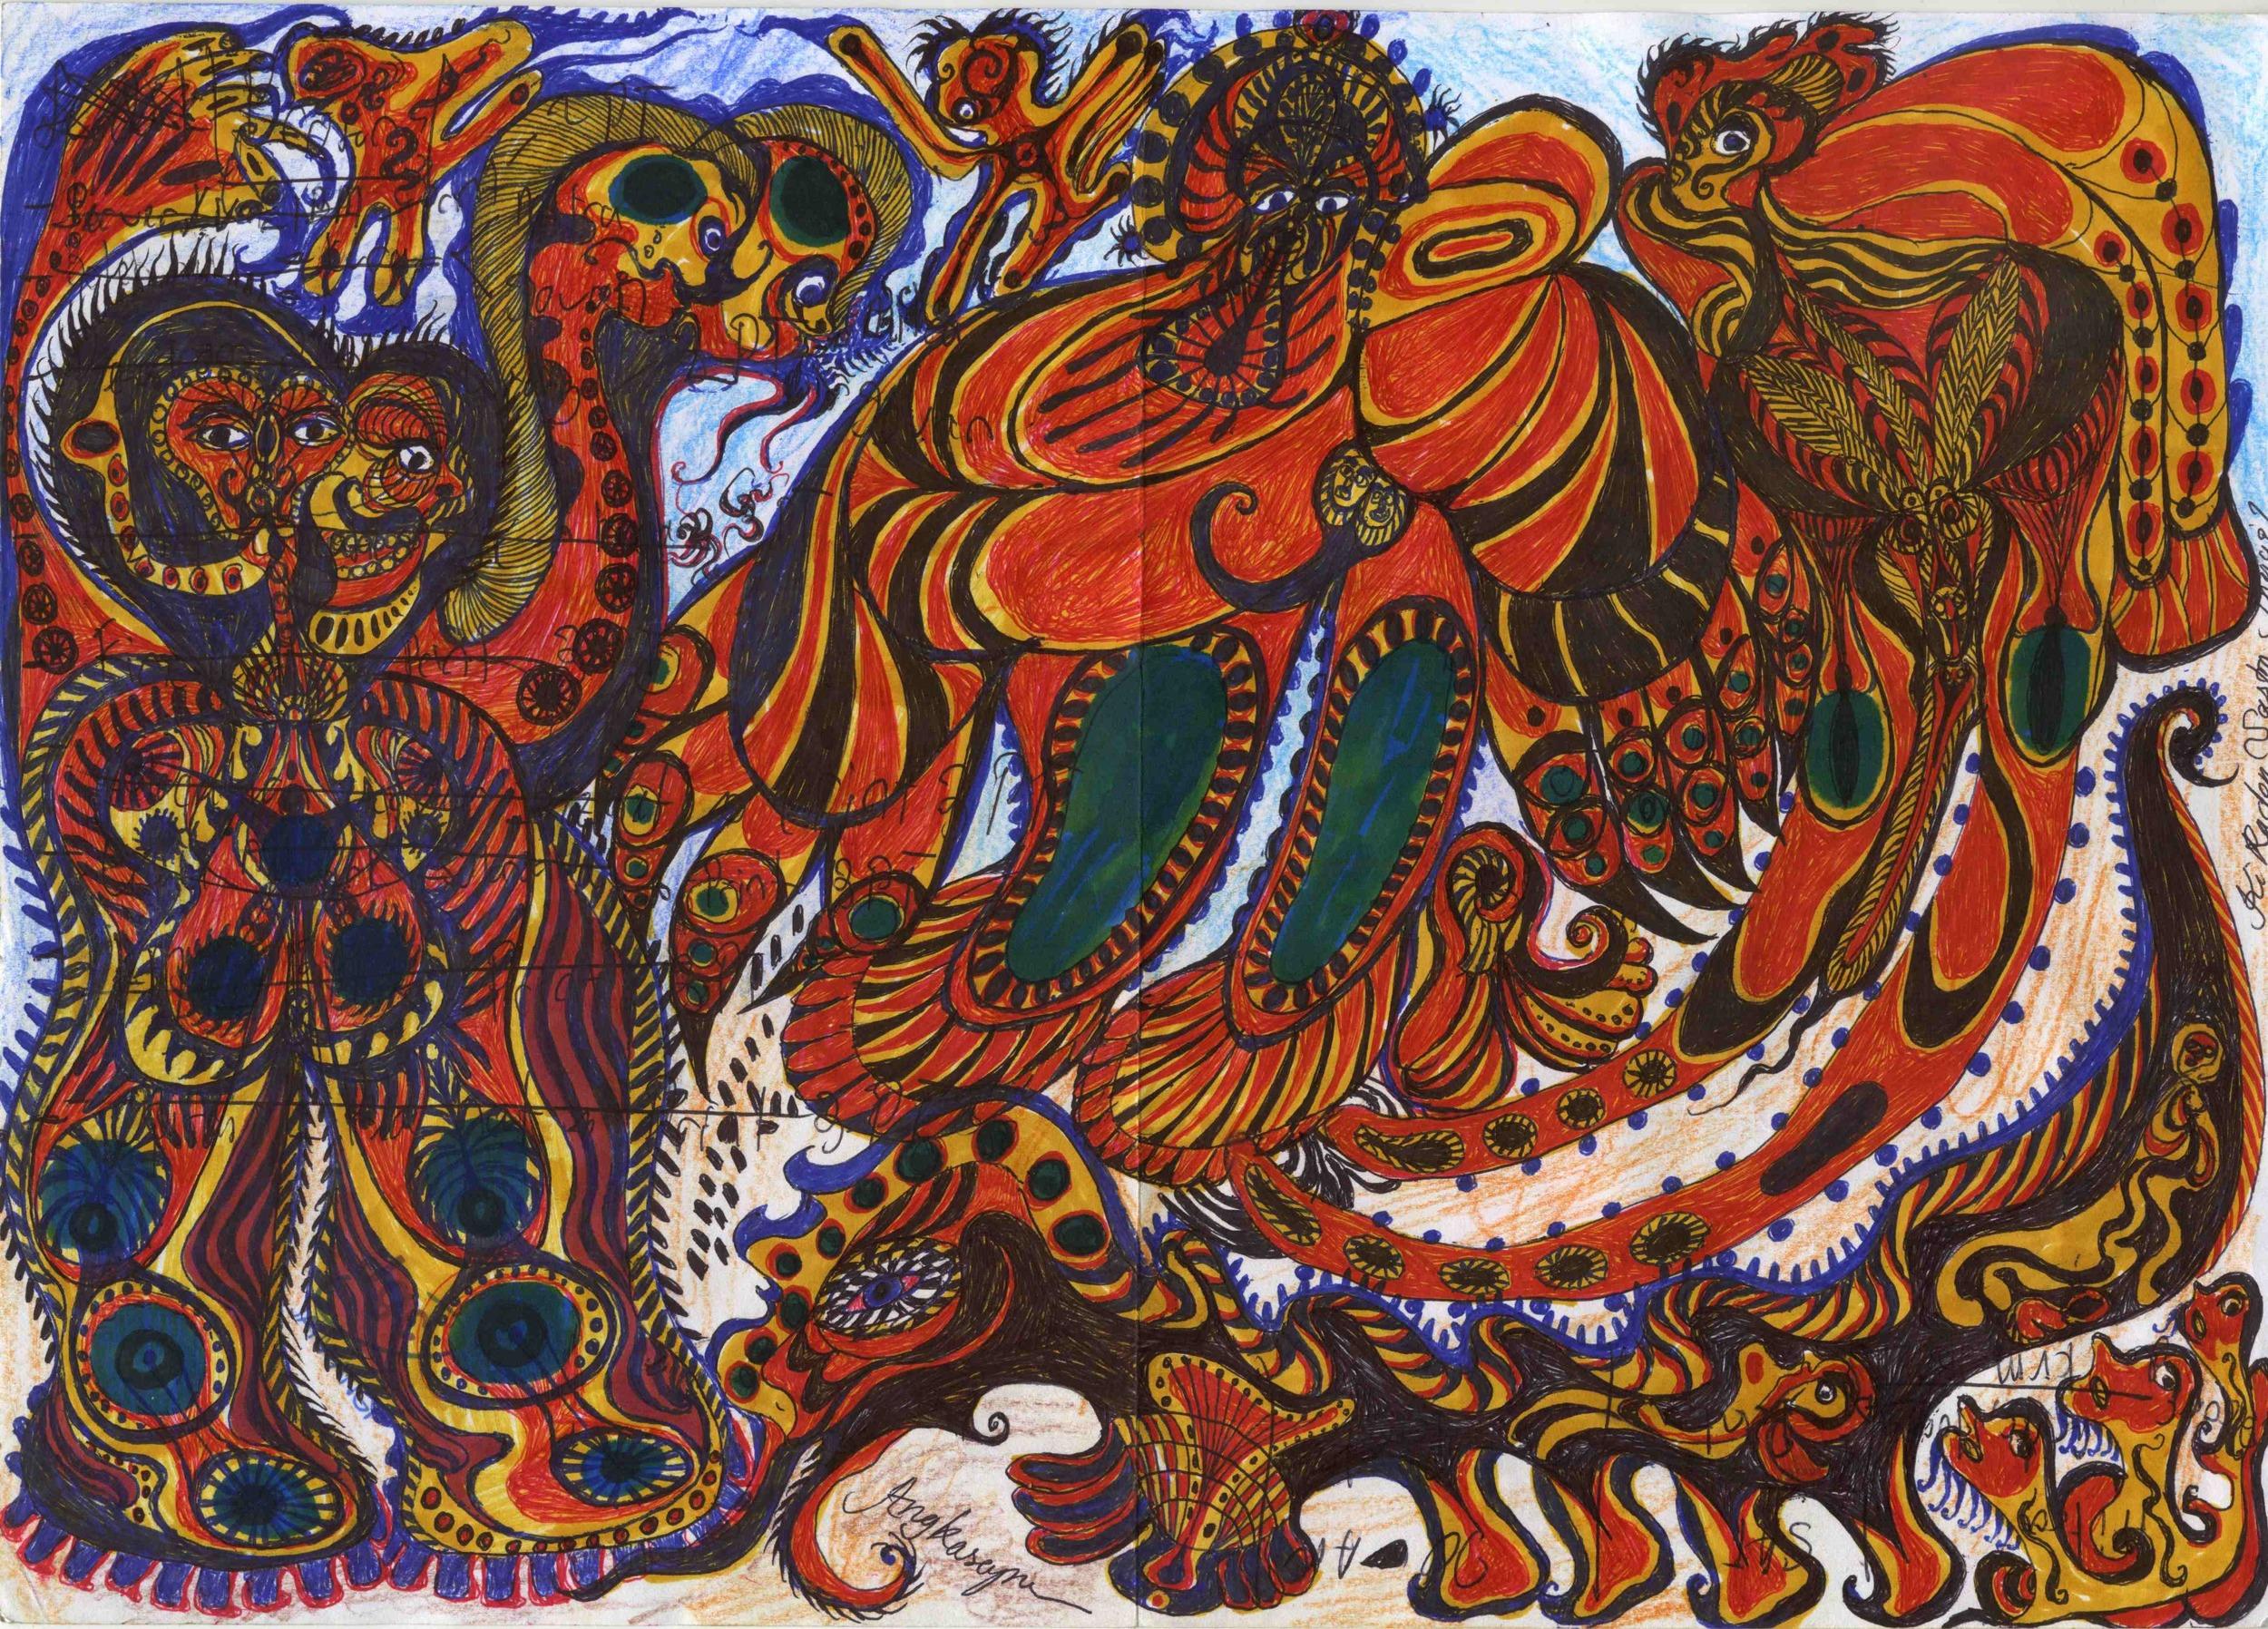 Noviadi Angkasapura    Untitled  , 2014 Ink on found paper 8.25 x 11.75 inches 21 x 29.8 cm NoA 105